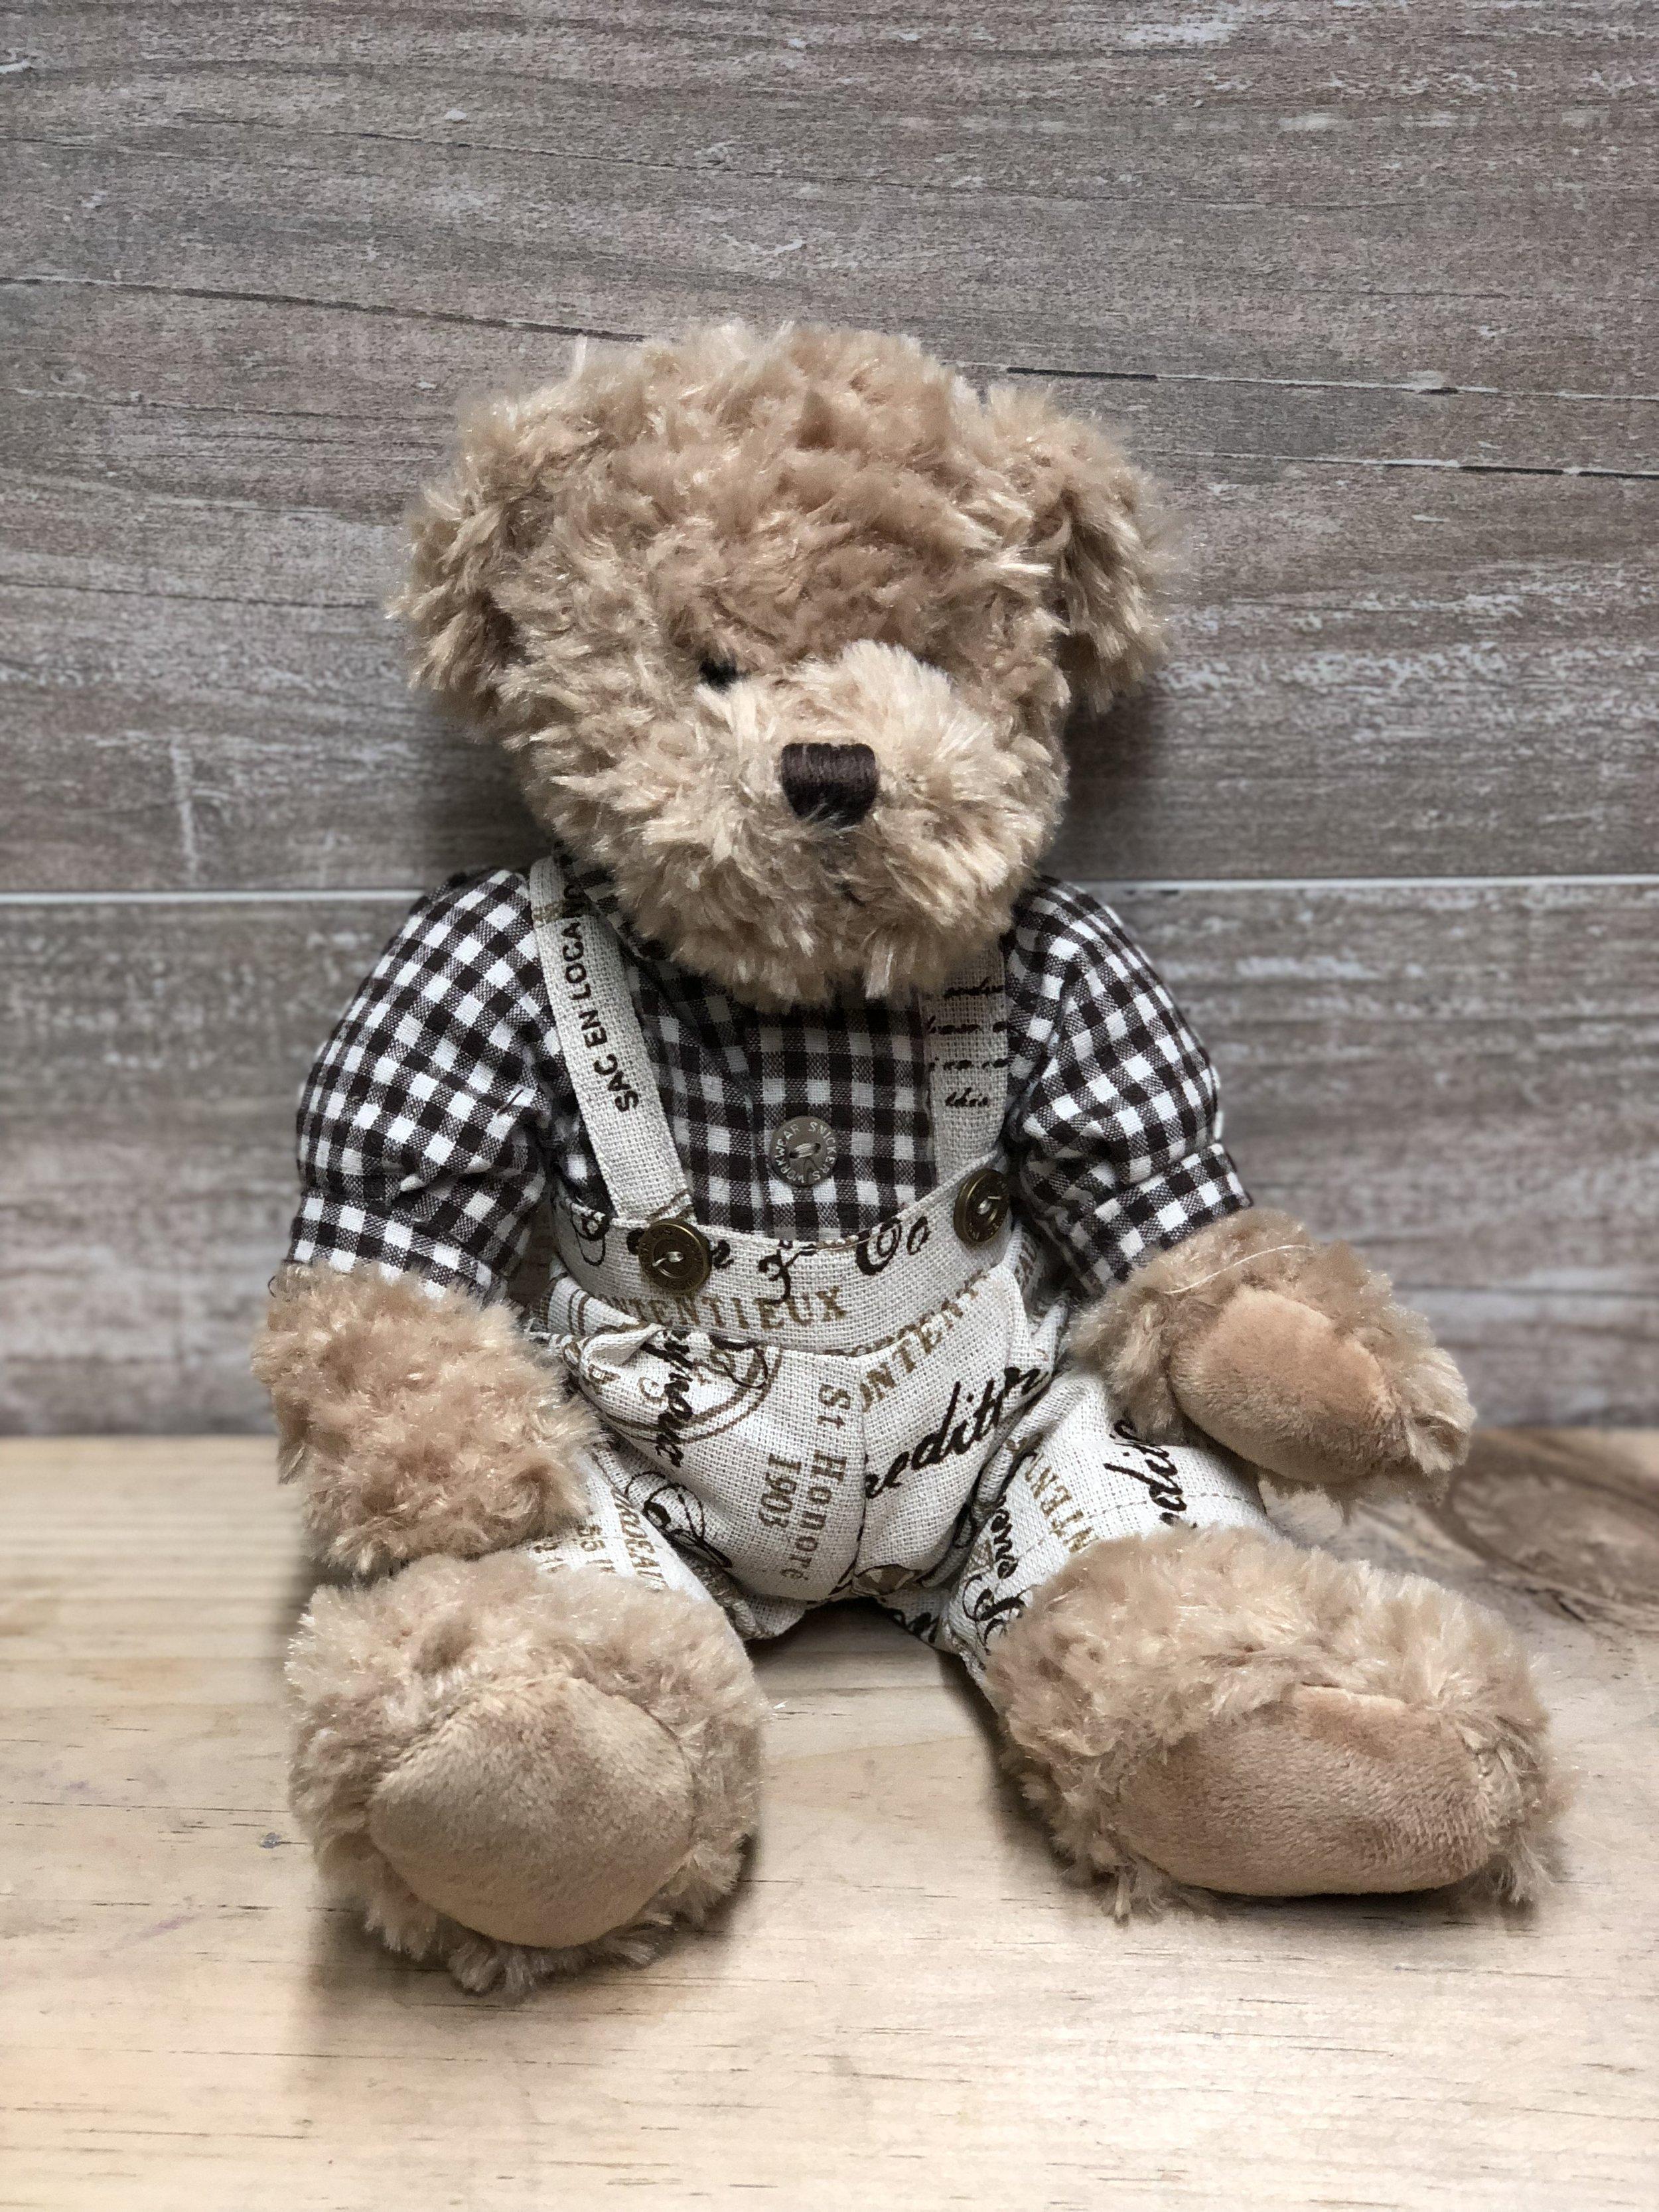 Overalls Vintage Teddy Bear -